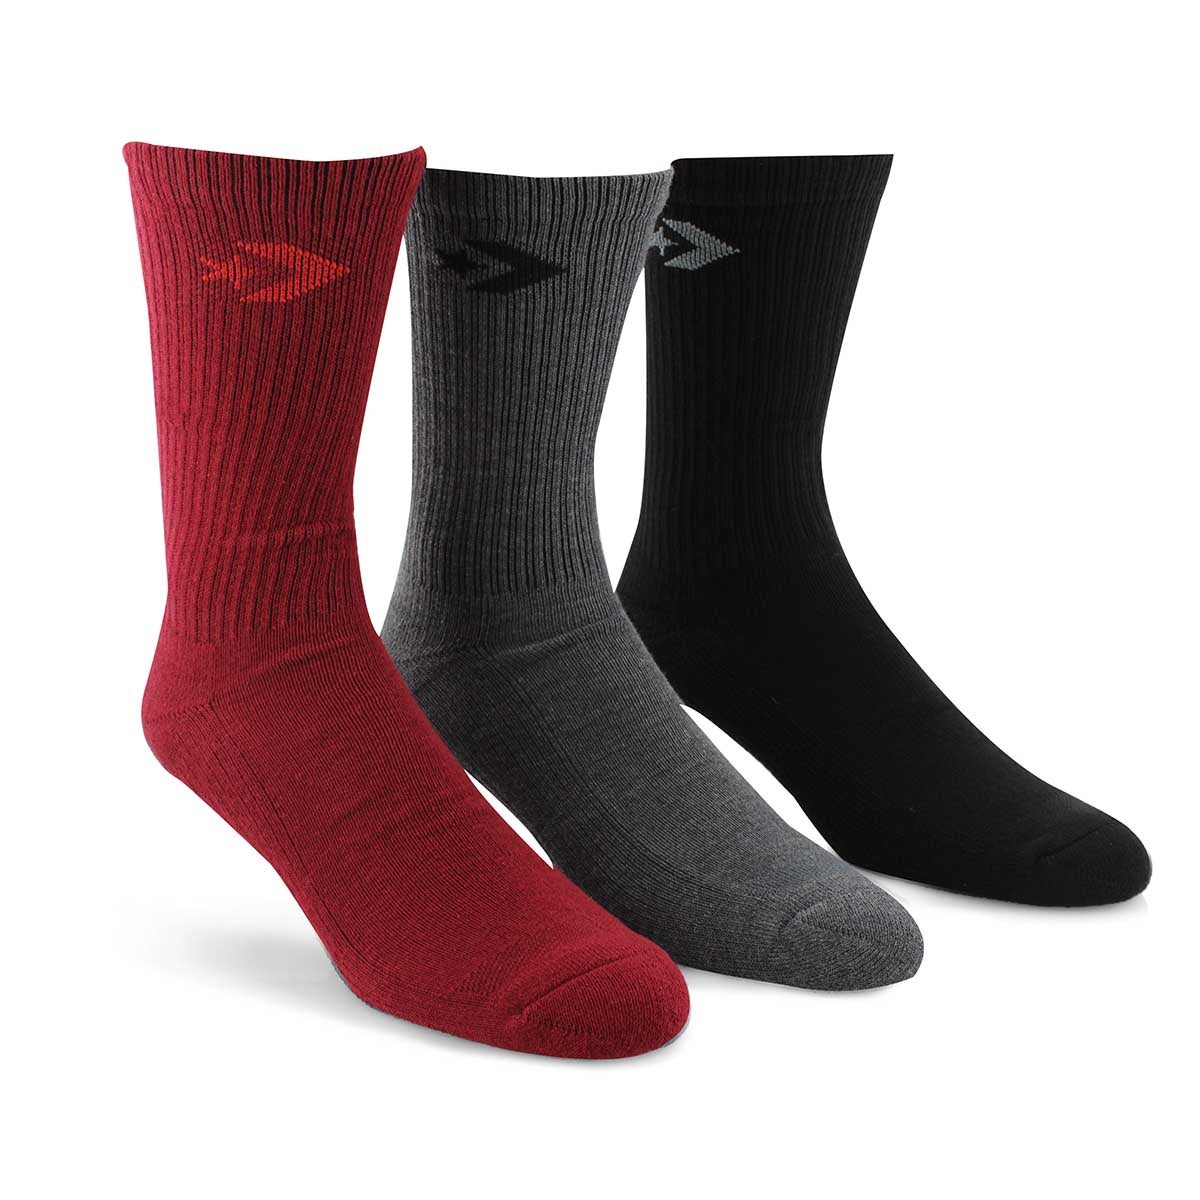 Mns Crew Classic multi sock 3 pk